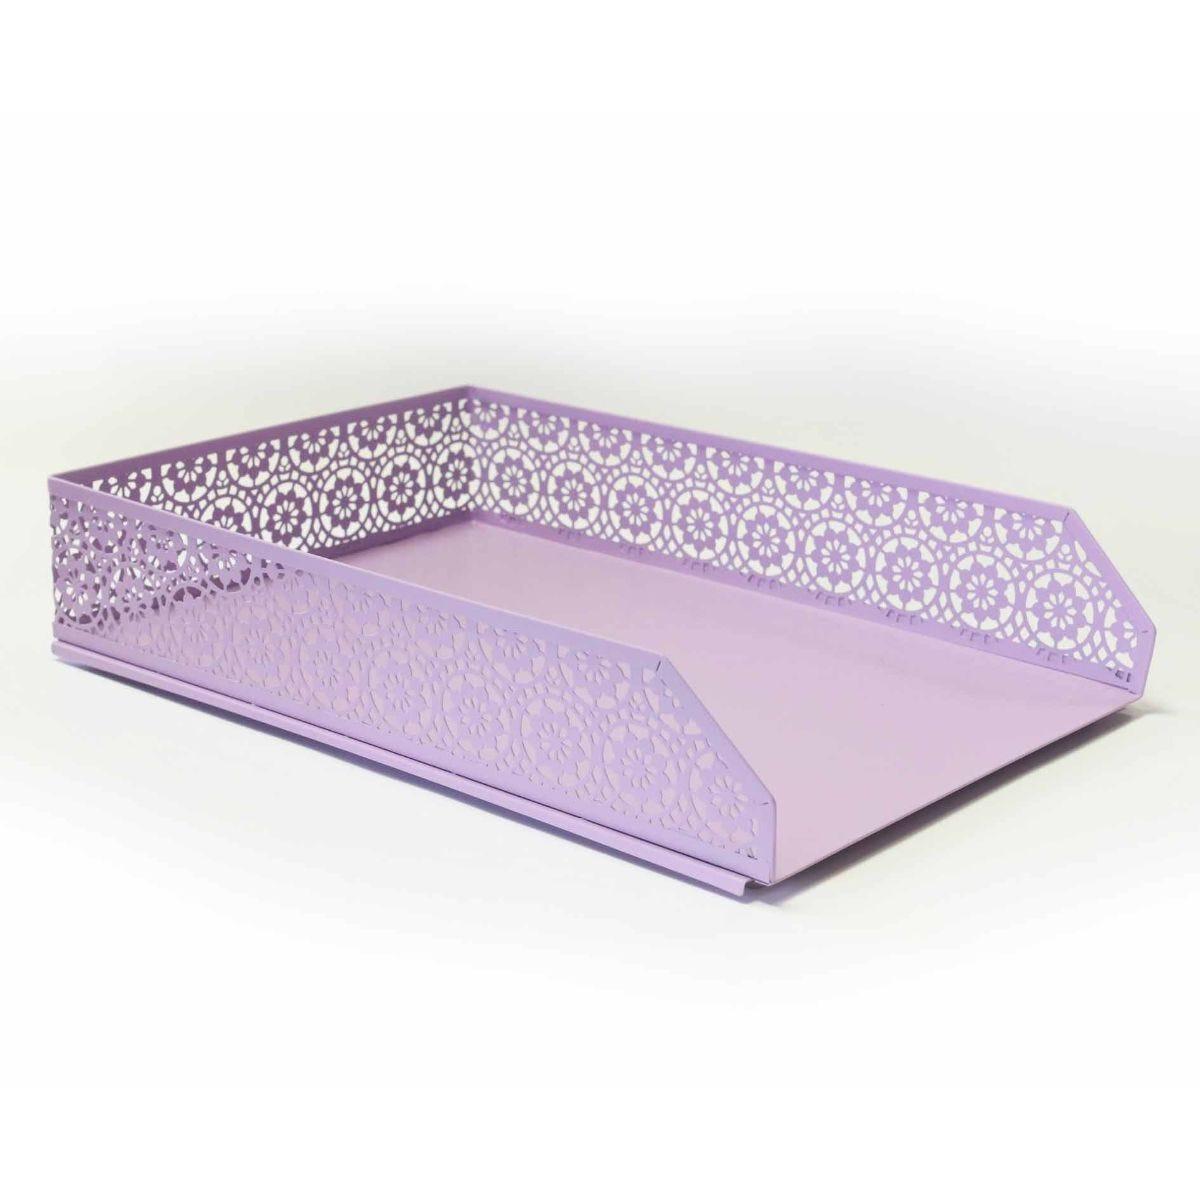 Ryman Floral Metal Letter Tray A4 Pastel Purple